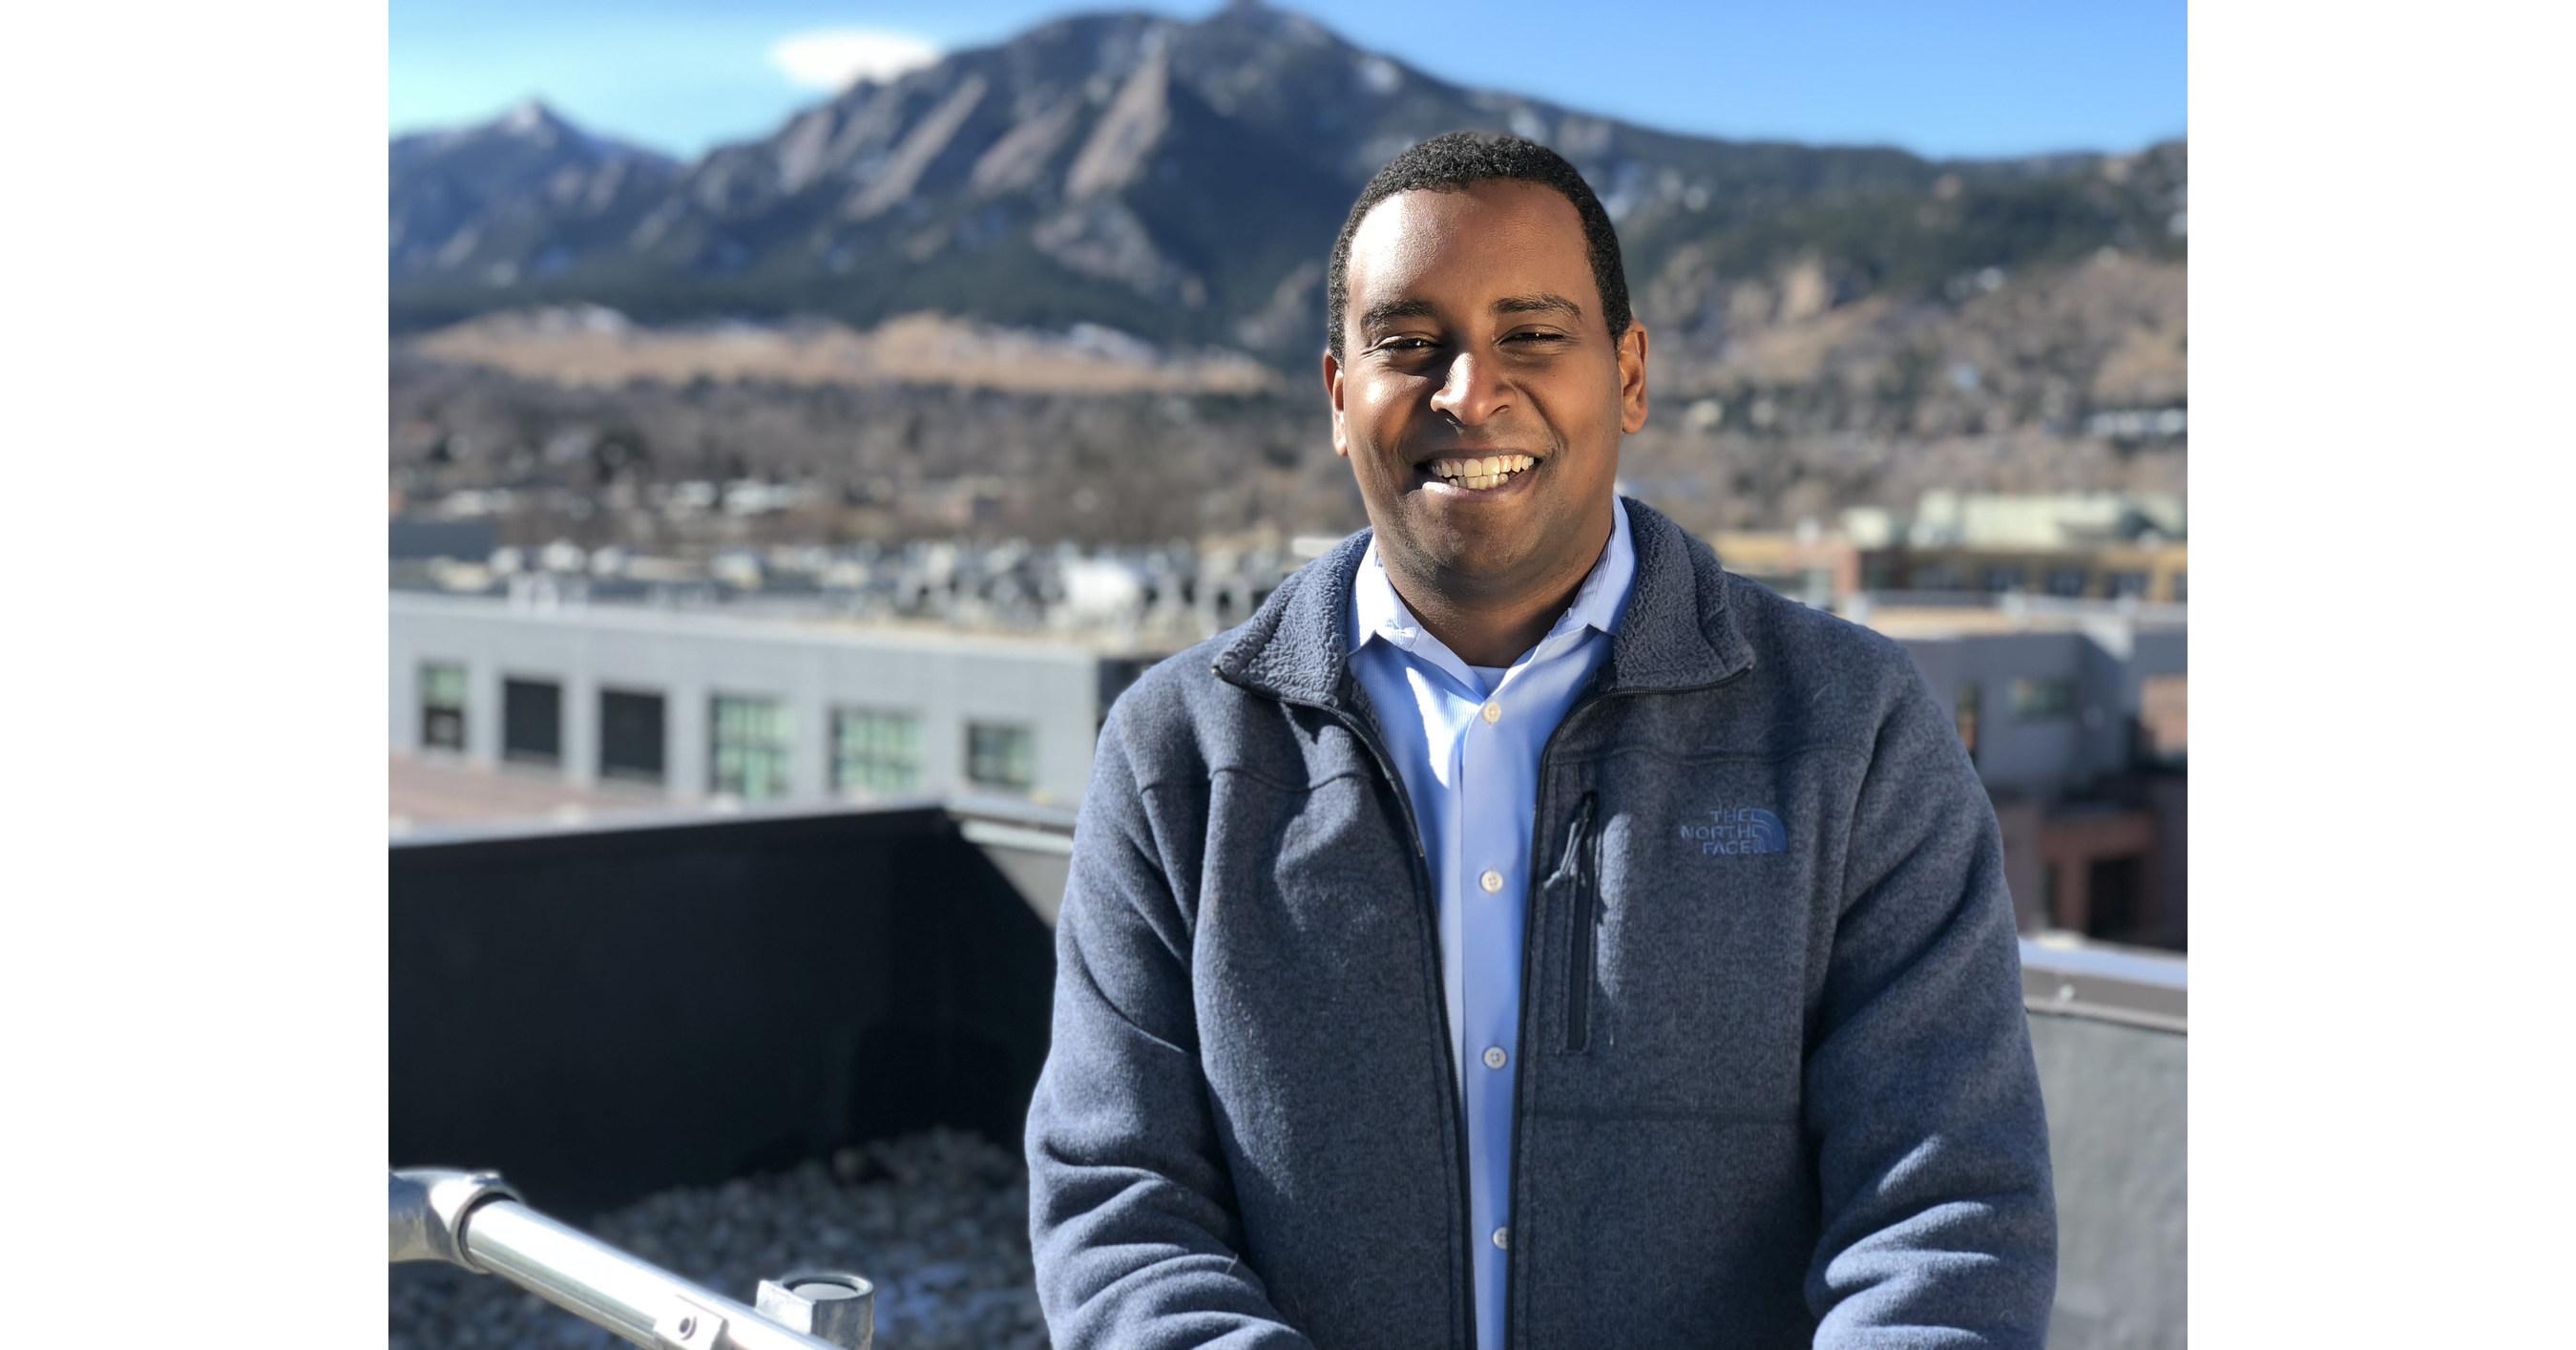 AFGE Endorses Colorado's Joe Neguse for Congress